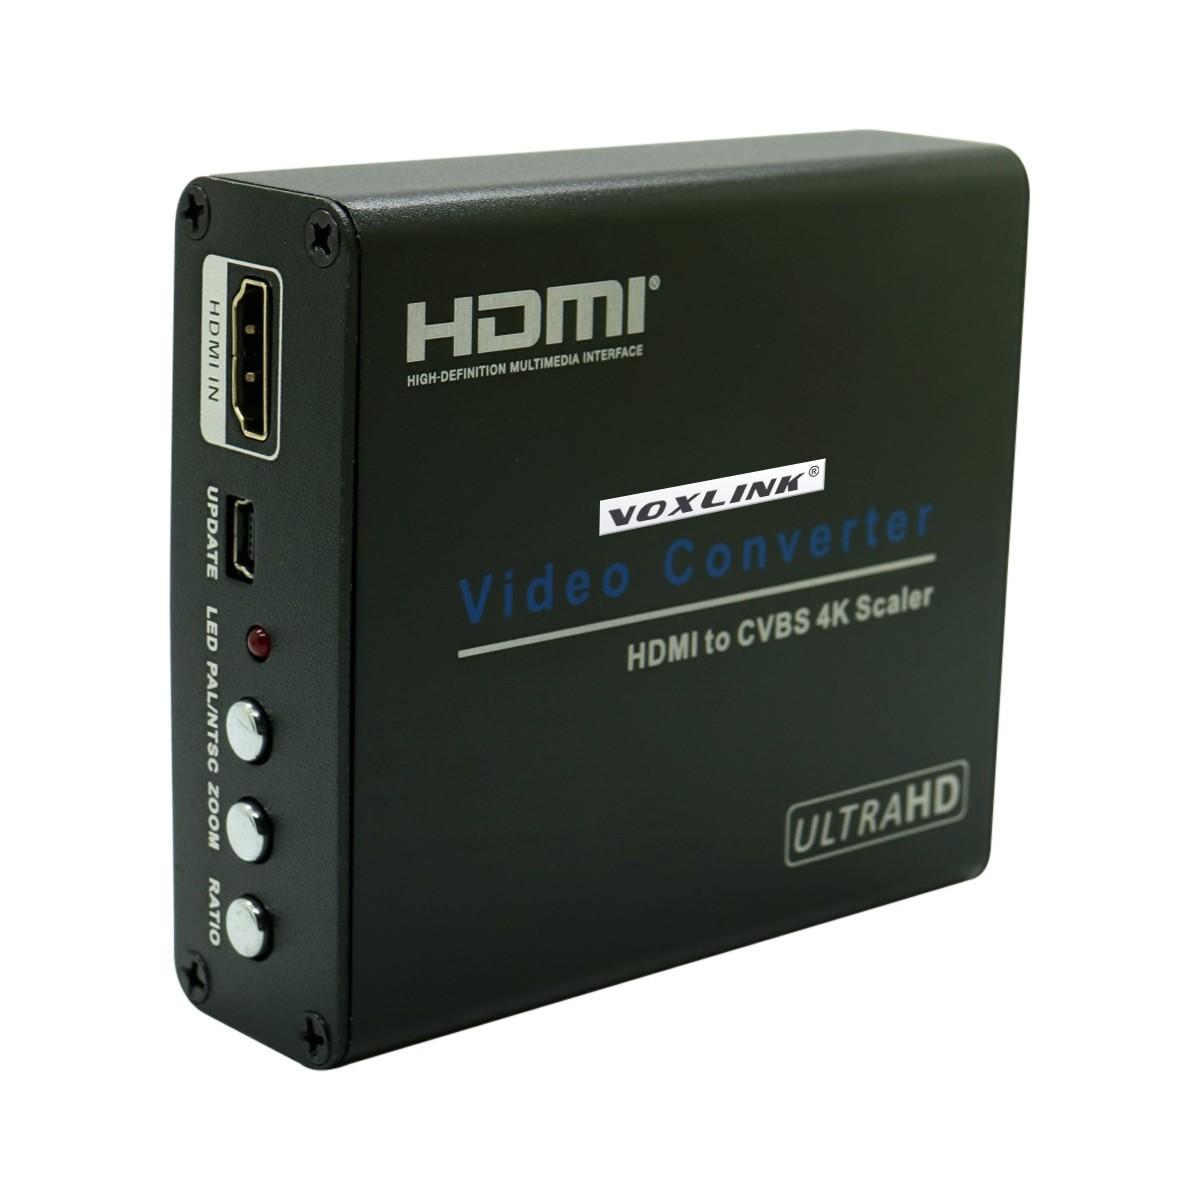 VOXLINK 4Kx2K HDMI to AV Converter Box